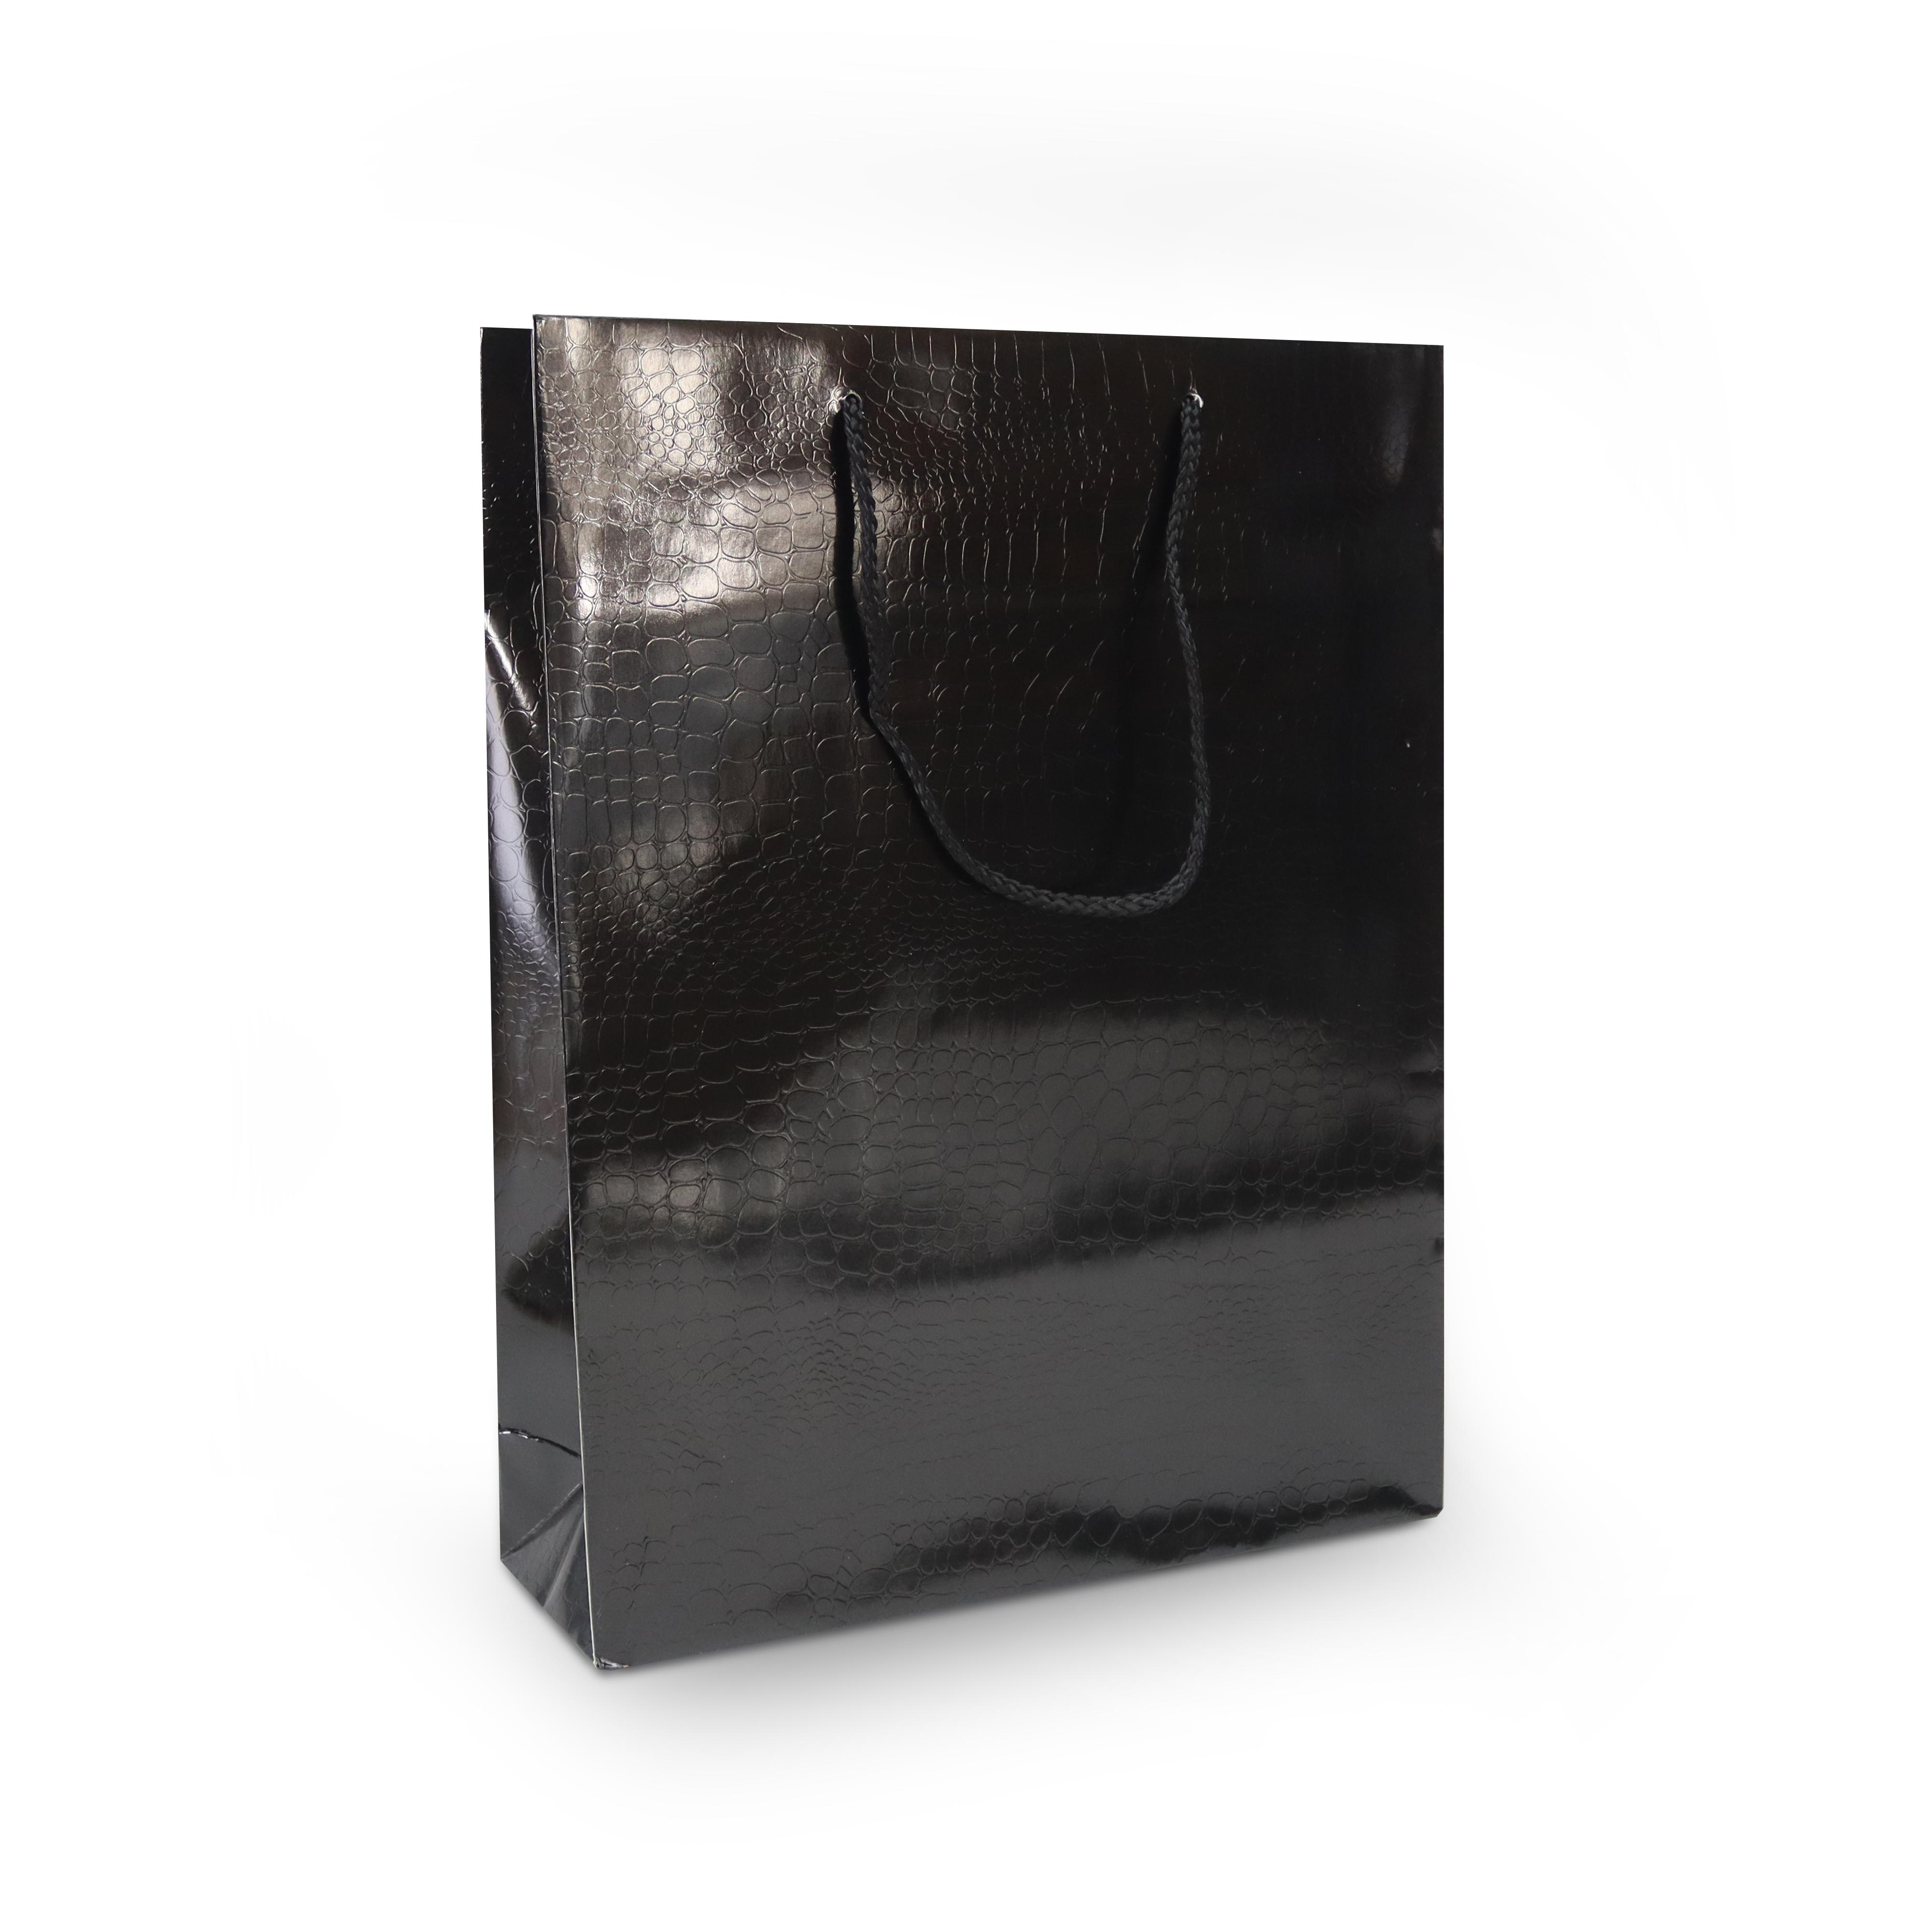 Luxe papieren tassen - Croco structuur